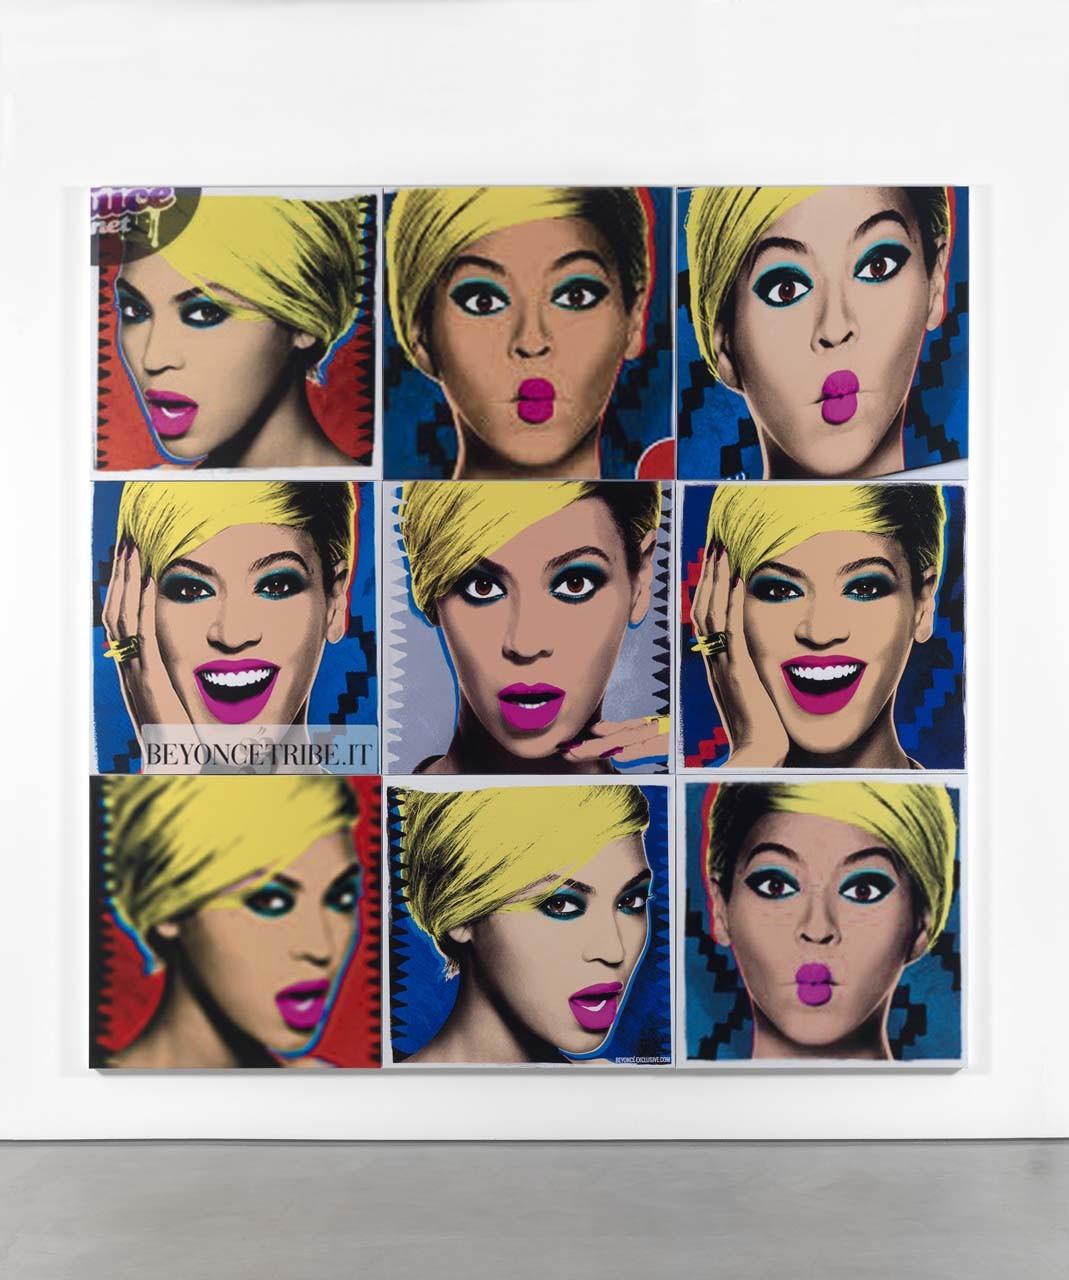 "<div class=""artwork_caption""><p>Beyoncé (3 x 3), 2015</p></div>"